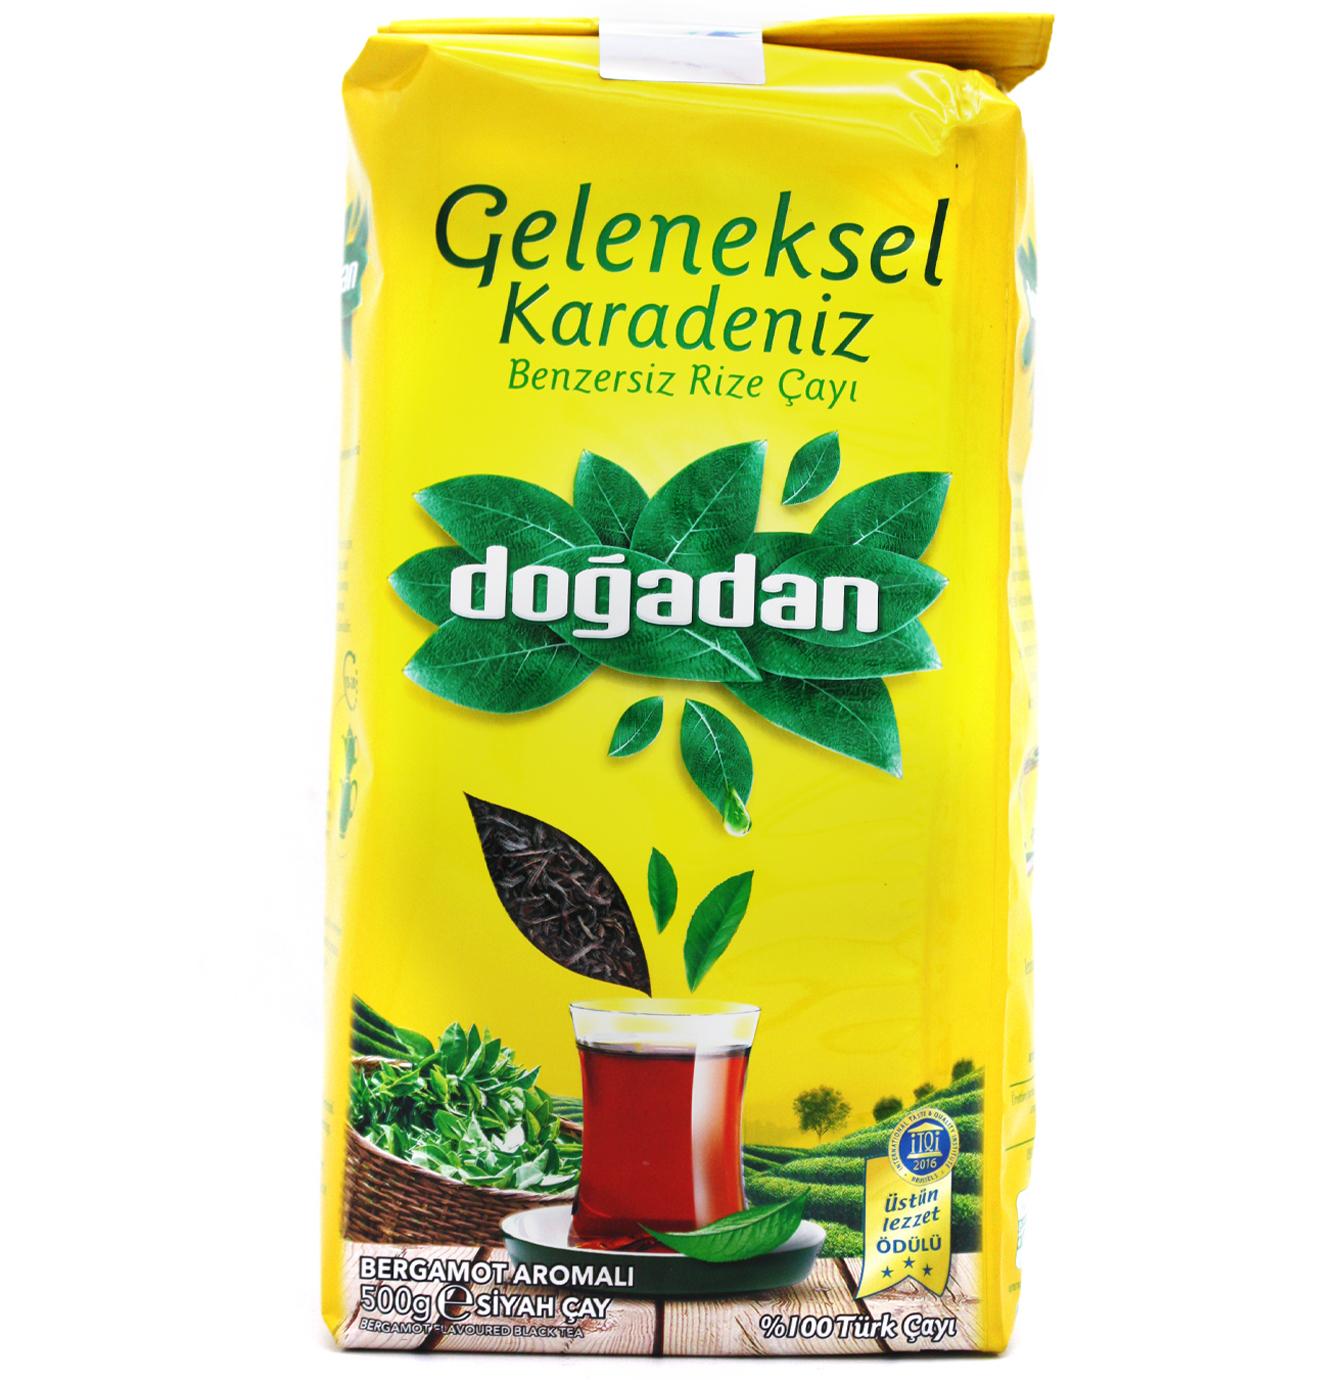 Чай Турецкий черный чай с бергамотом Karadeniz, Dogadan, 500 г import_files_40_40f06b2b69be11e9a9ac484d7ecee297_fcee9d9b6b1011e9a9ac484d7ecee297.jpg